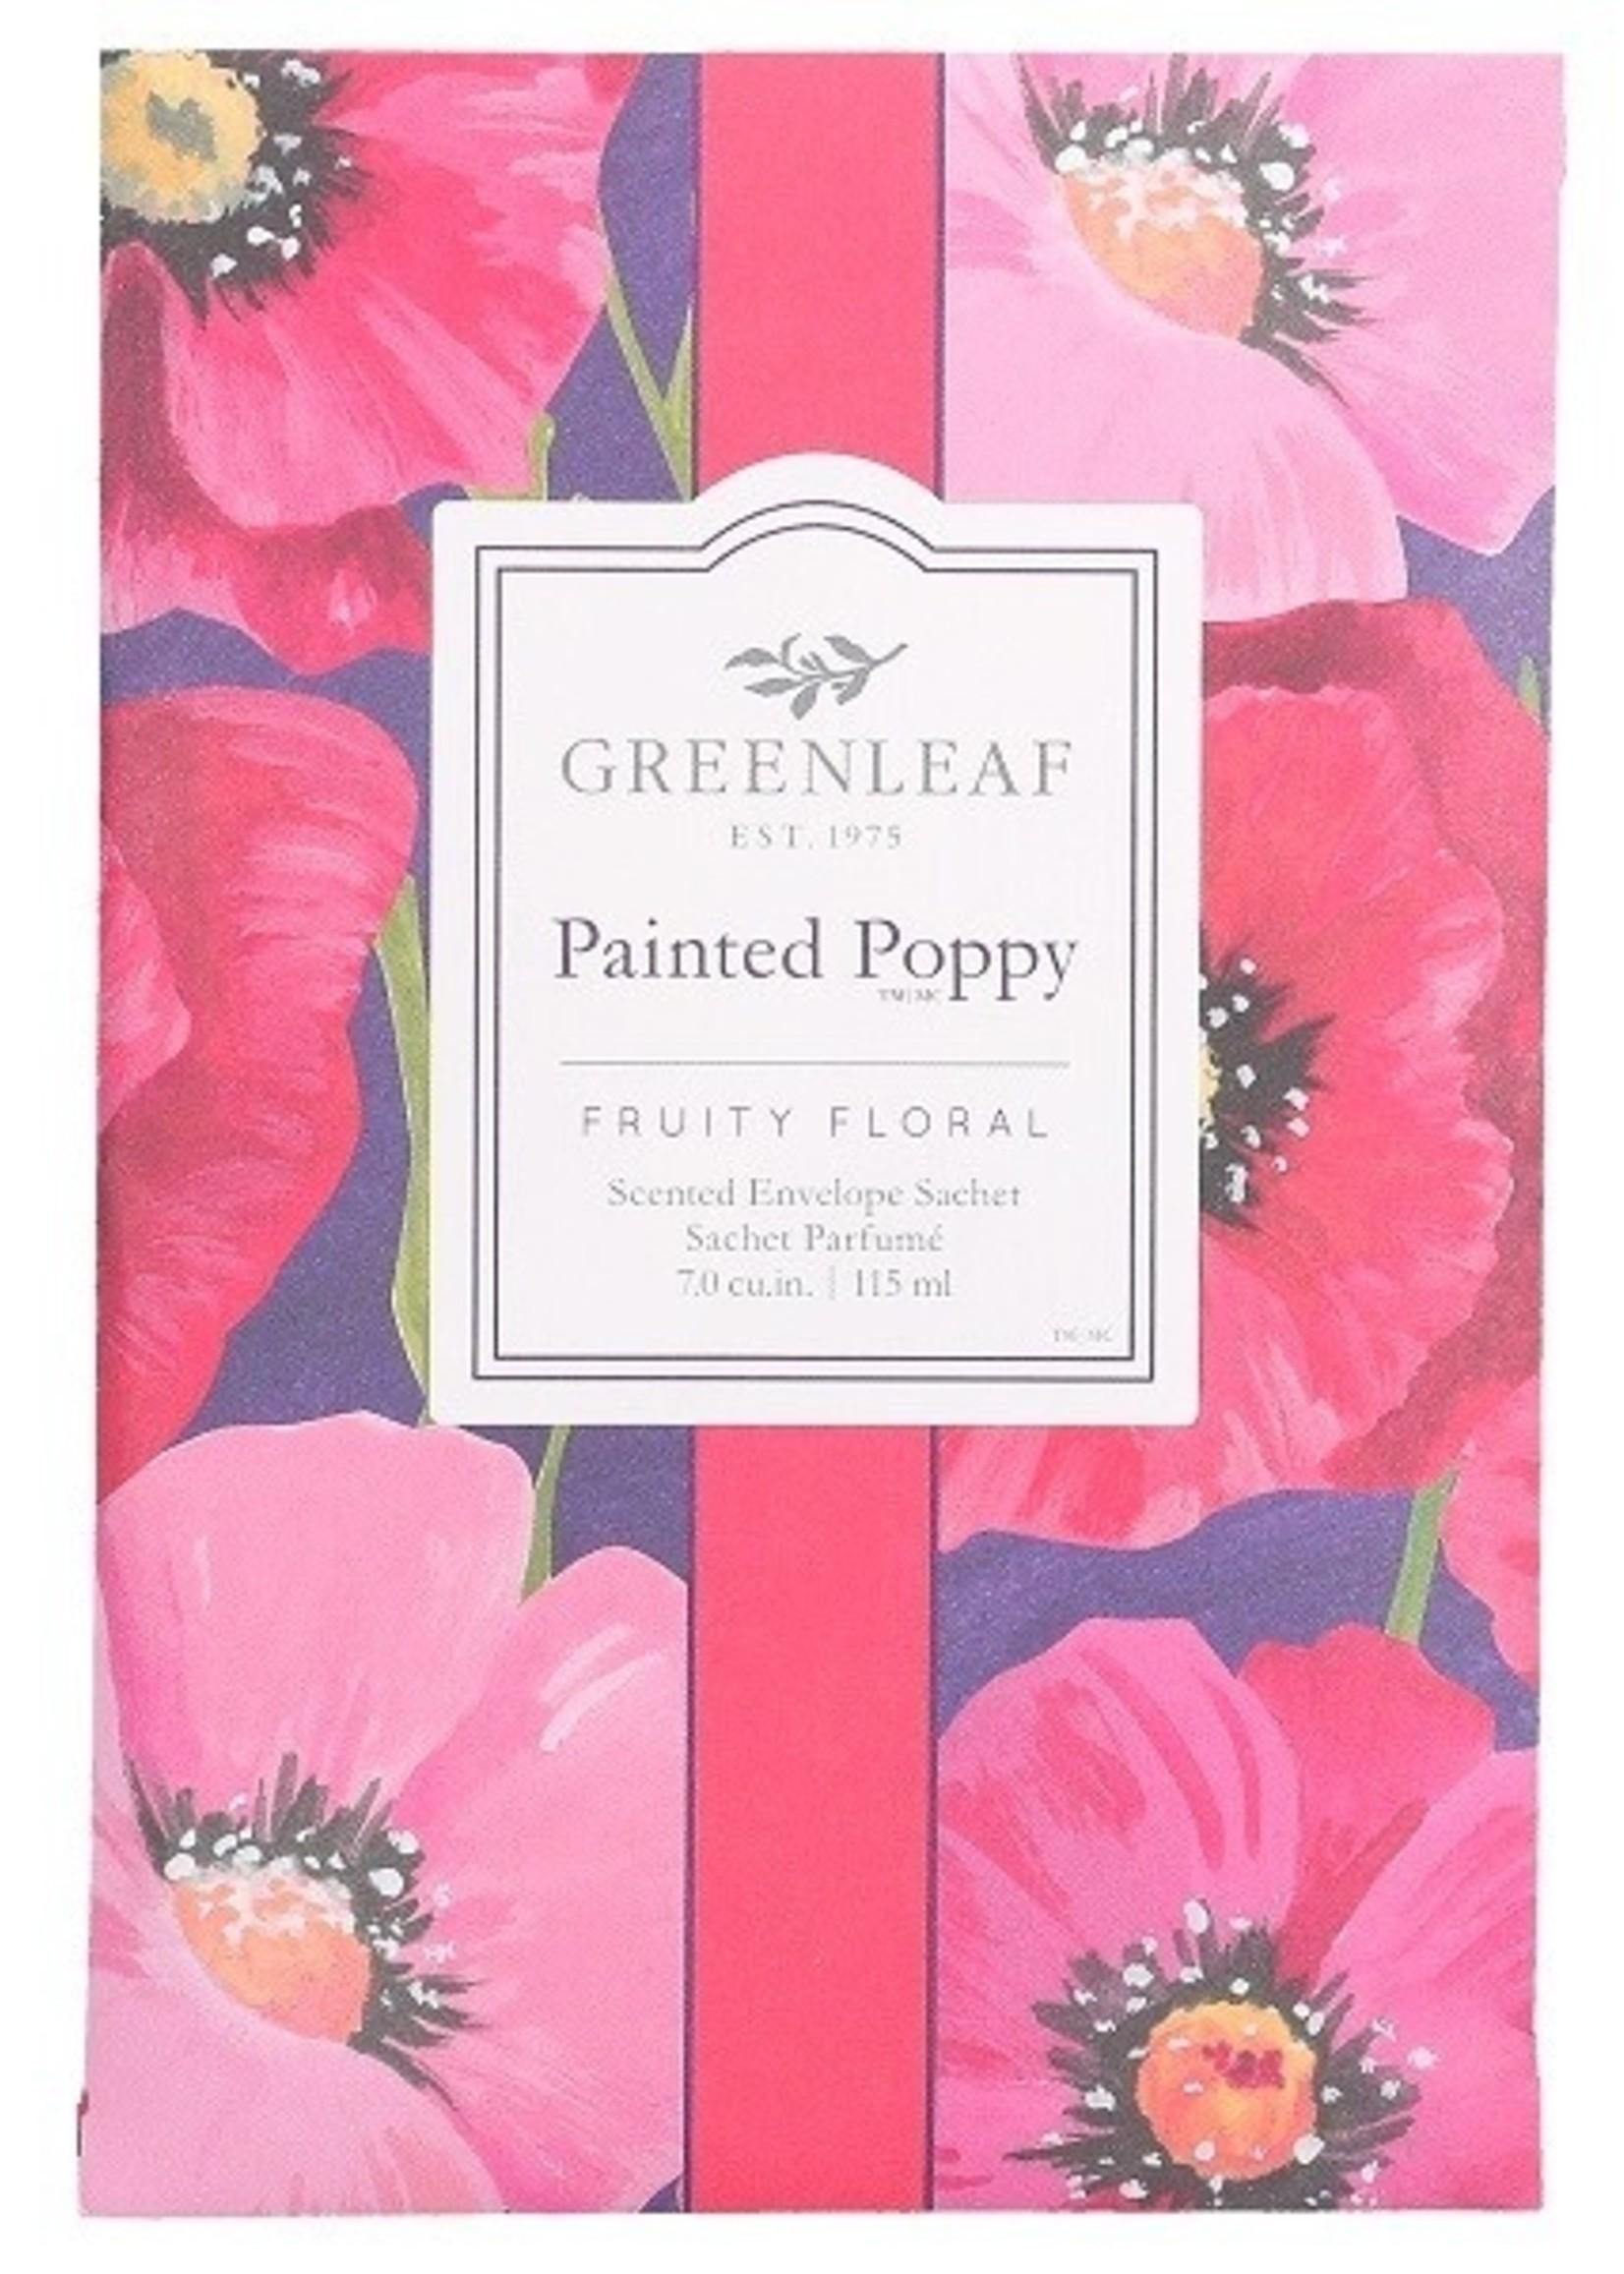 Greenleaf Greenleaf Geurzakje Painted Poppy